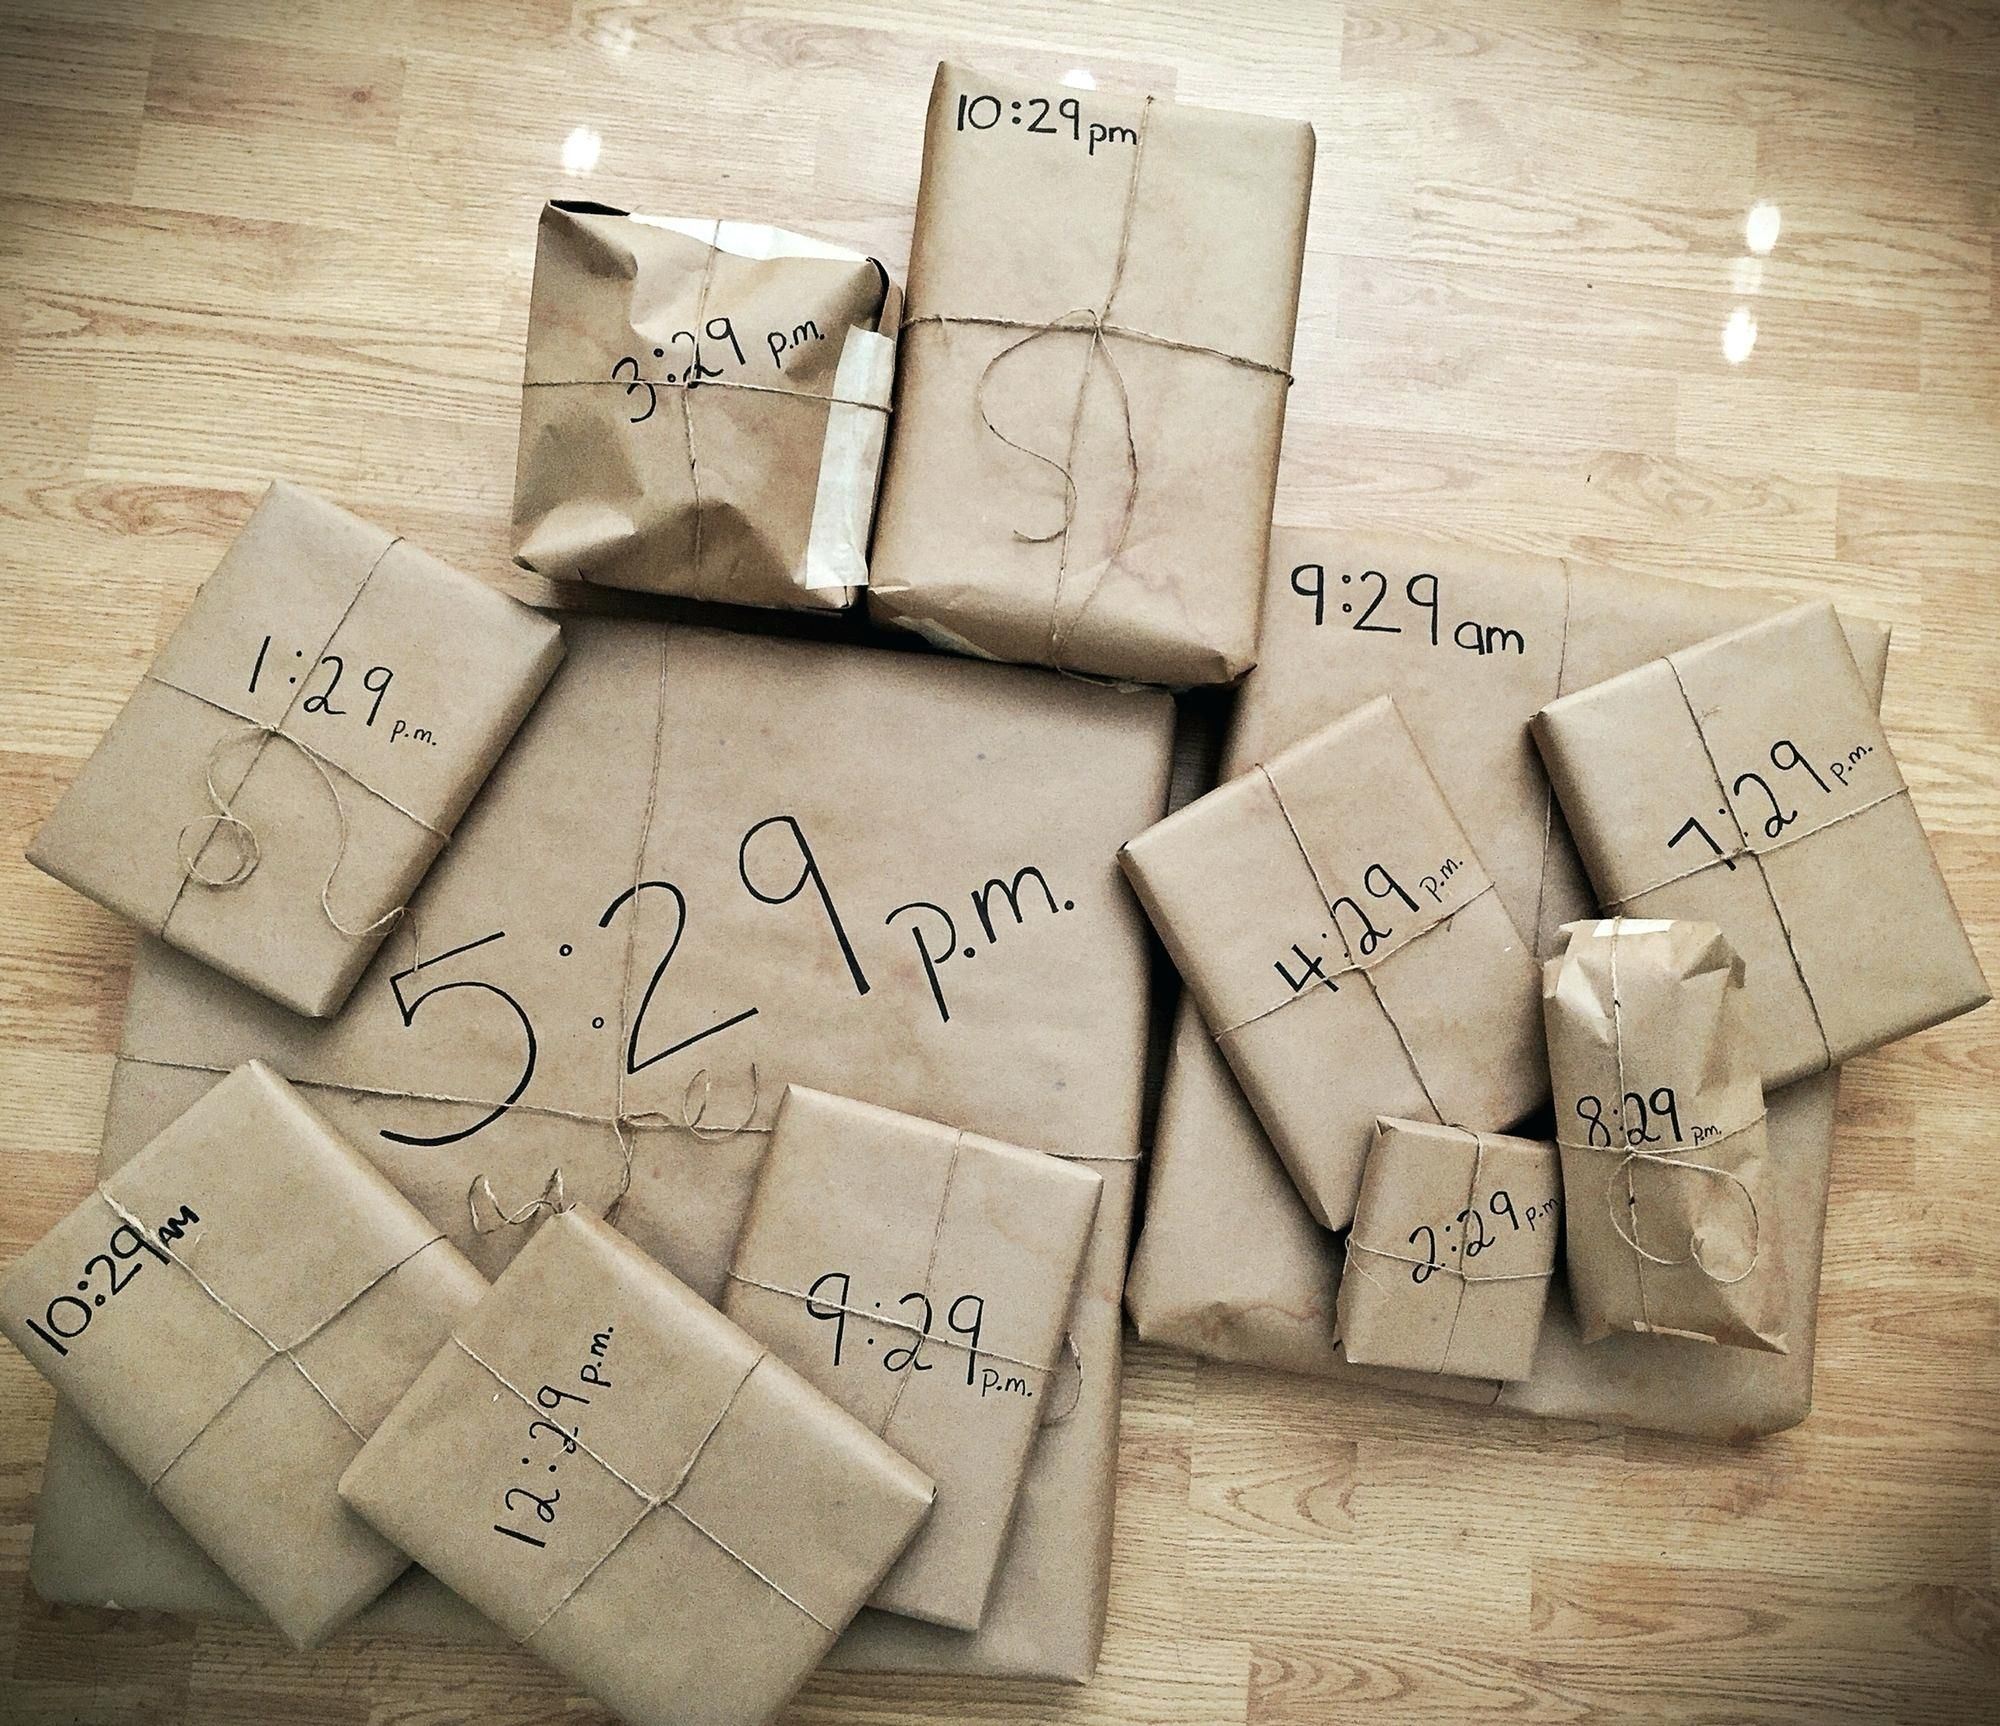 creative birthday surprise ideas for girlfriend | birthday gift